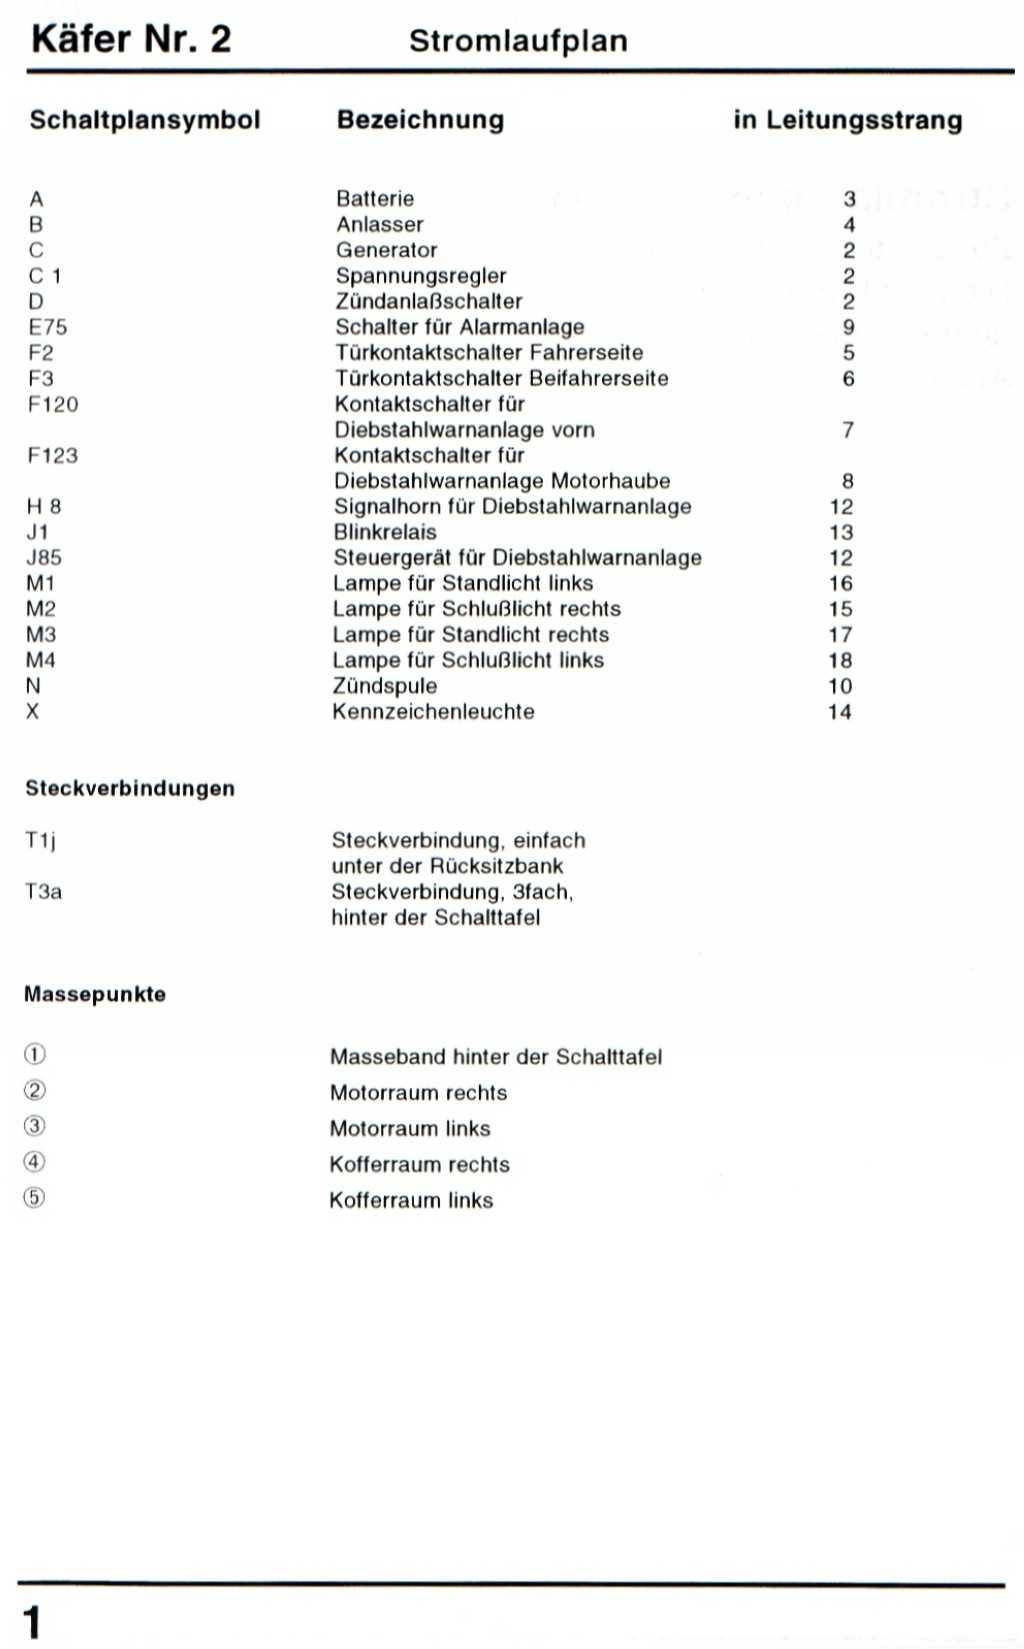 Charmant Ford Zündspule Schaltplan Fotos - Schaltplan Serie Circuit ...